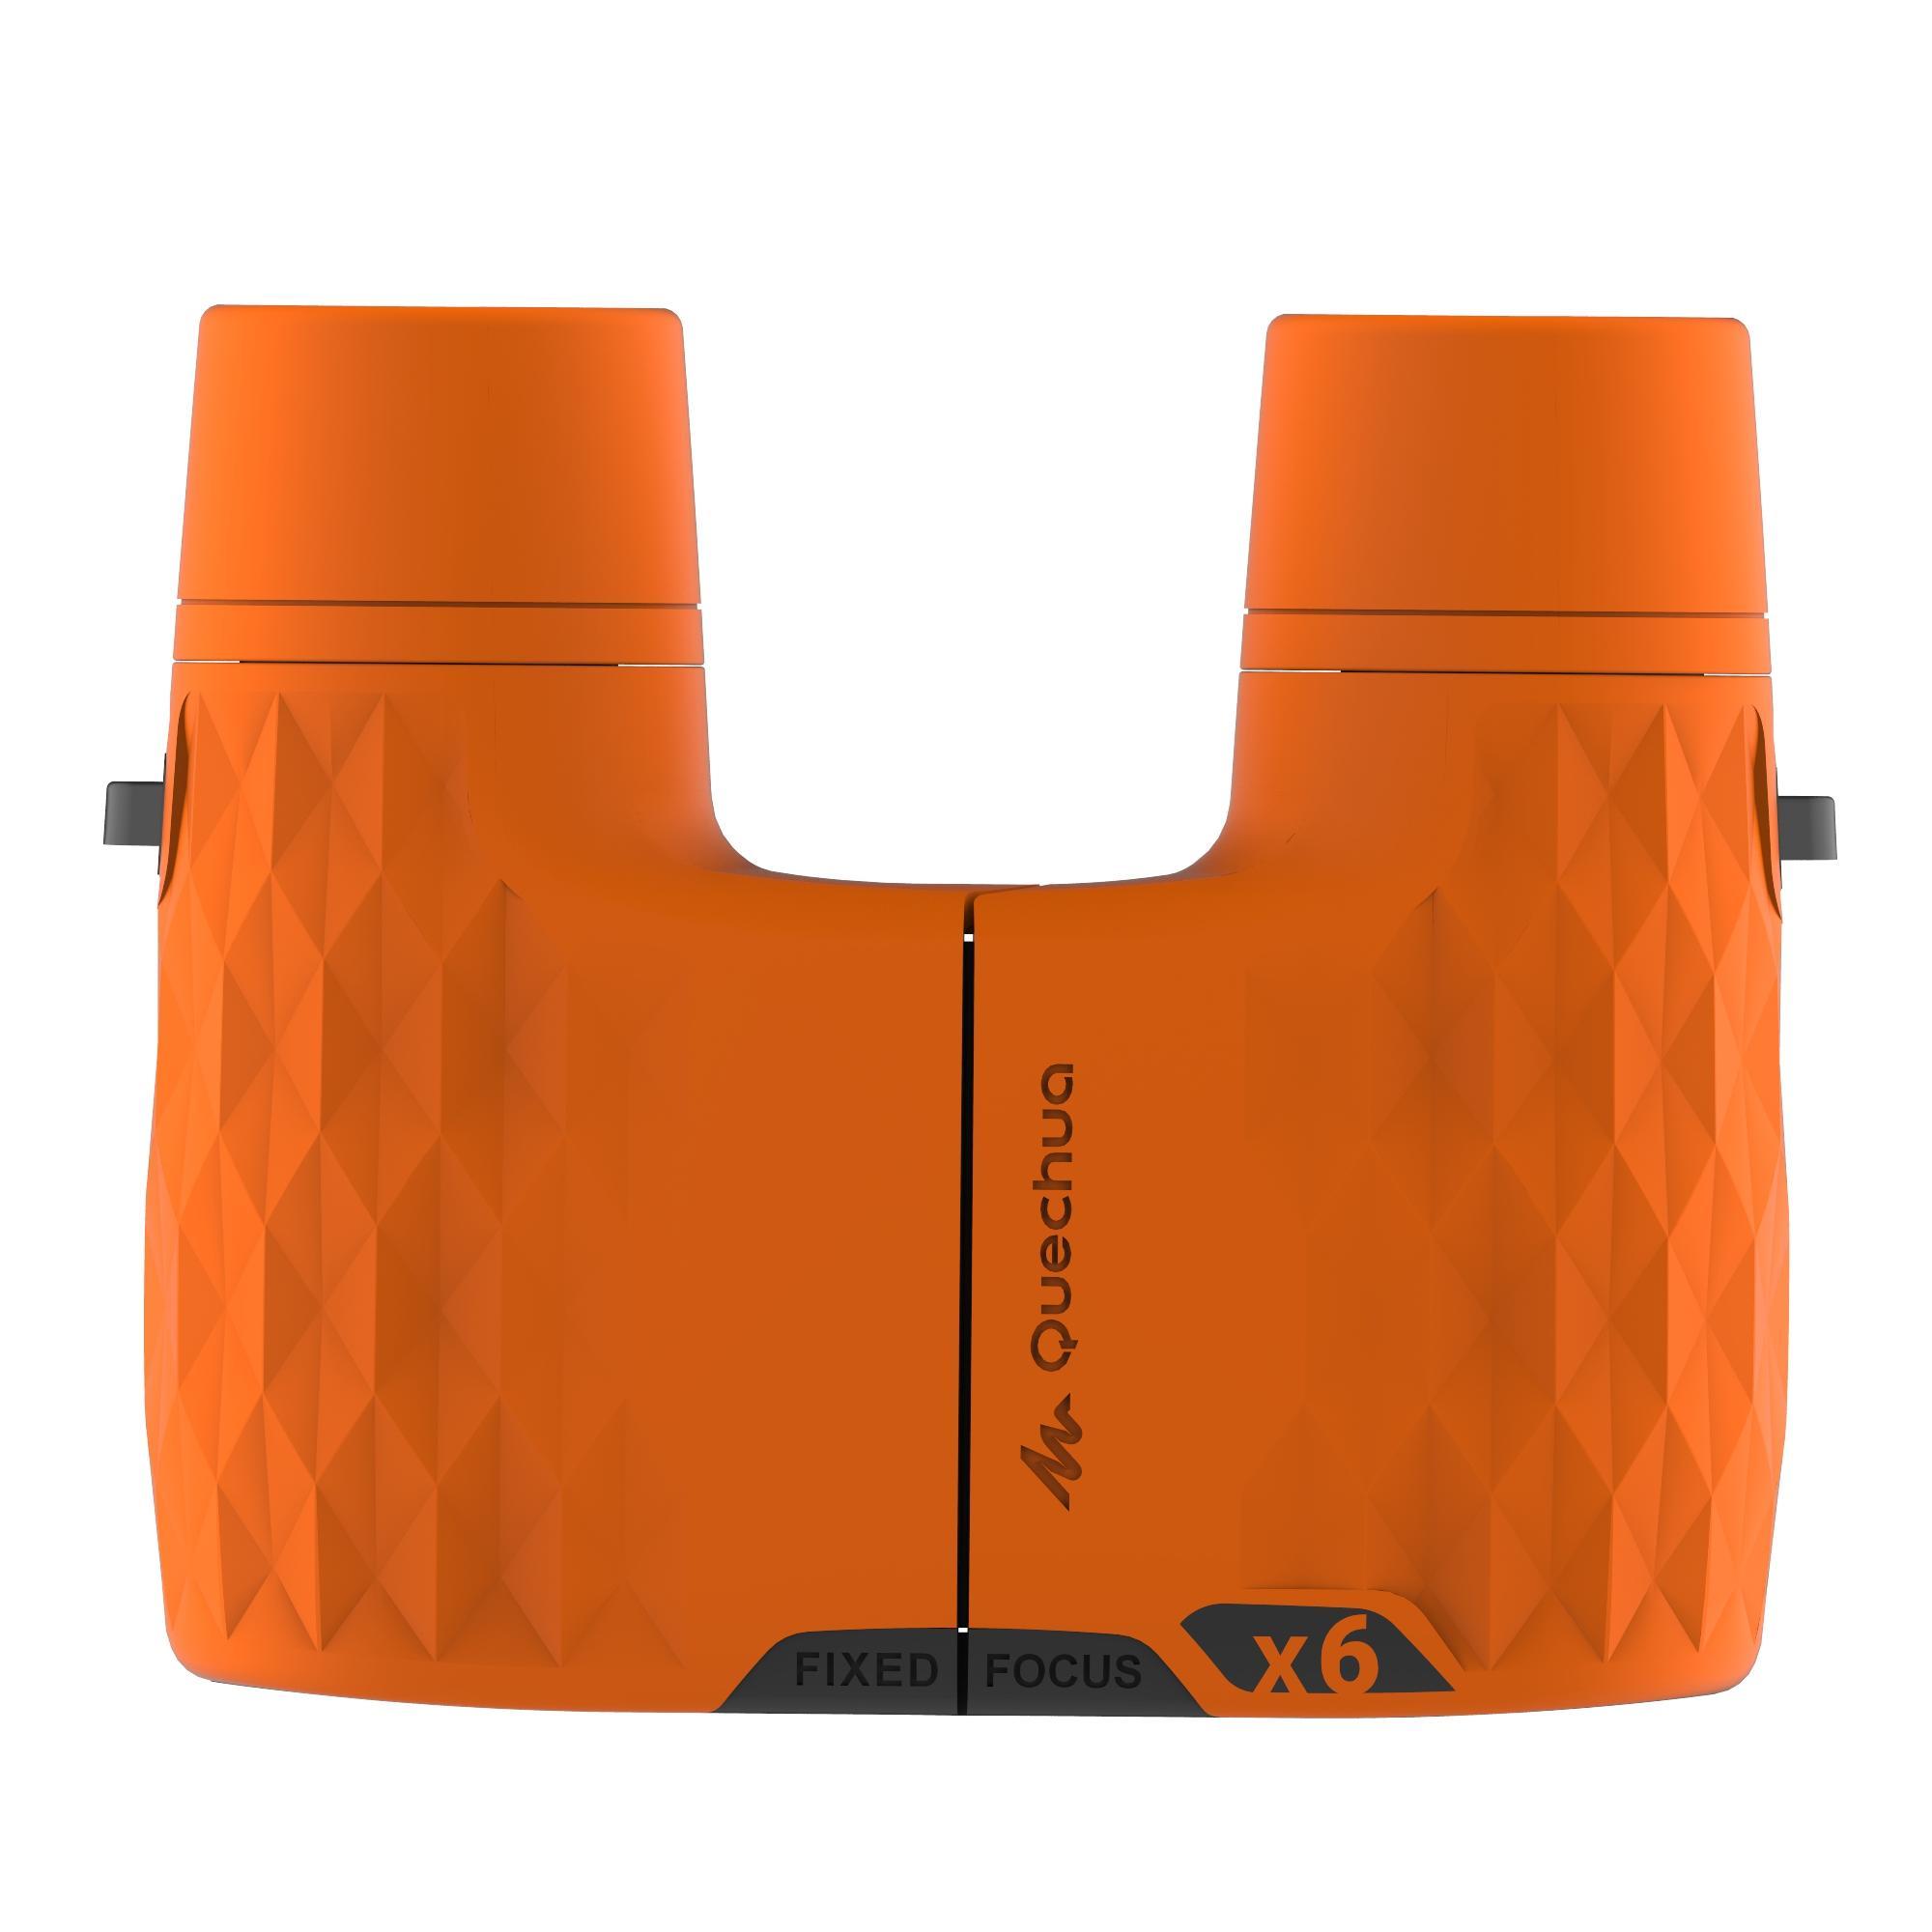 MH B100 Kids' Fixed Focus Binoculars x6 Magnification - Orange